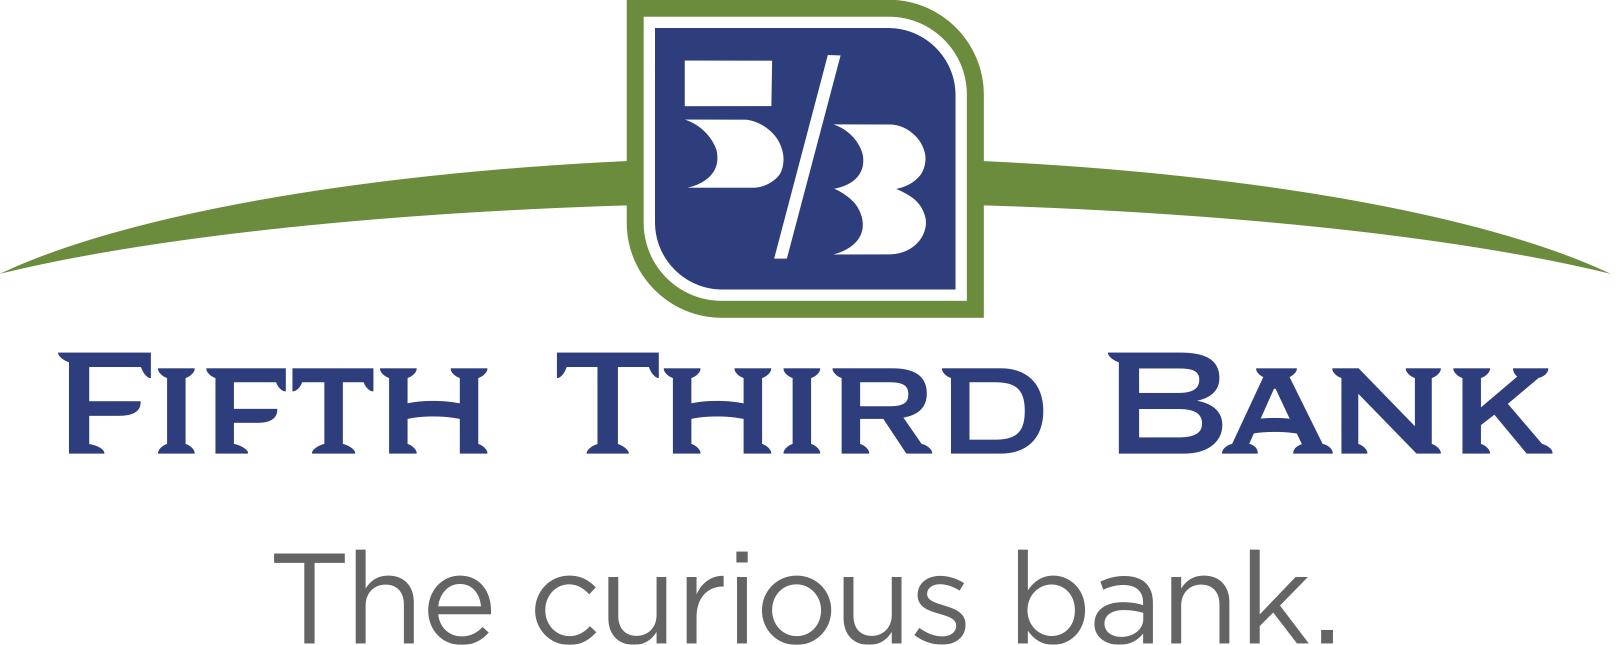 Fifth Third Bank Logo_7-2015.jpg